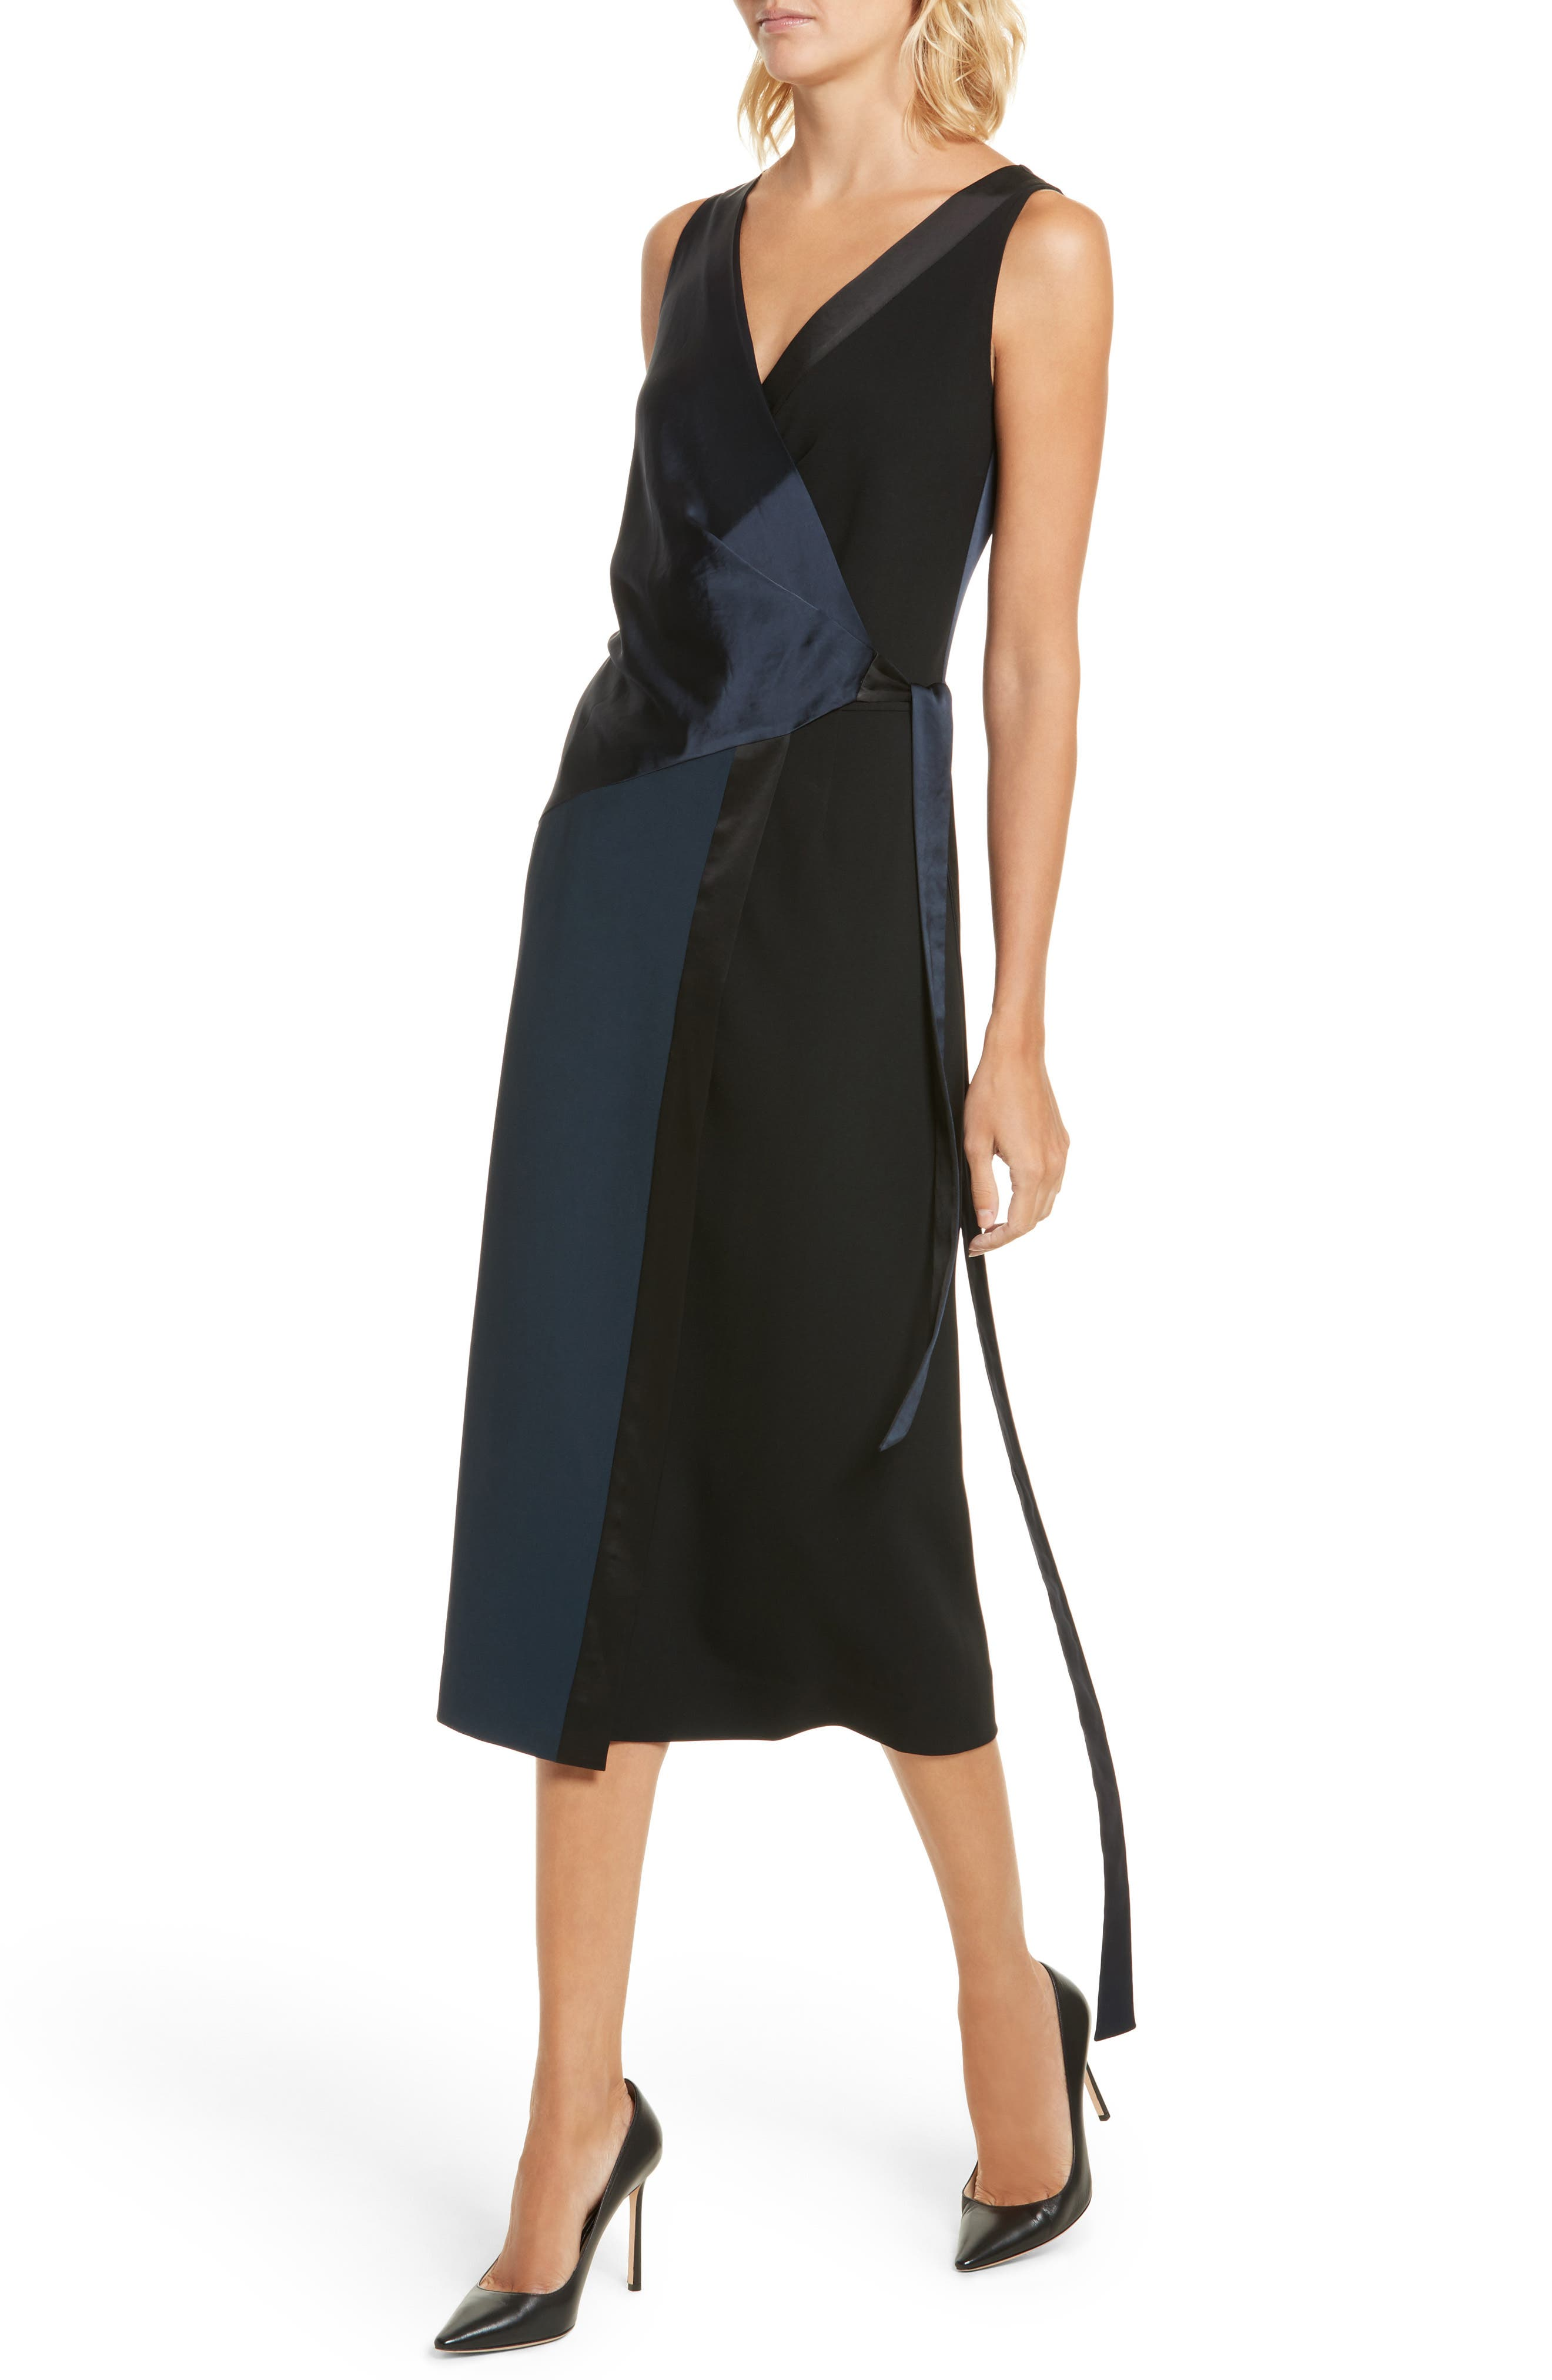 Midi Wrap Dress,                             Alternate thumbnail 4, color,                             Alexander Navy/ Black